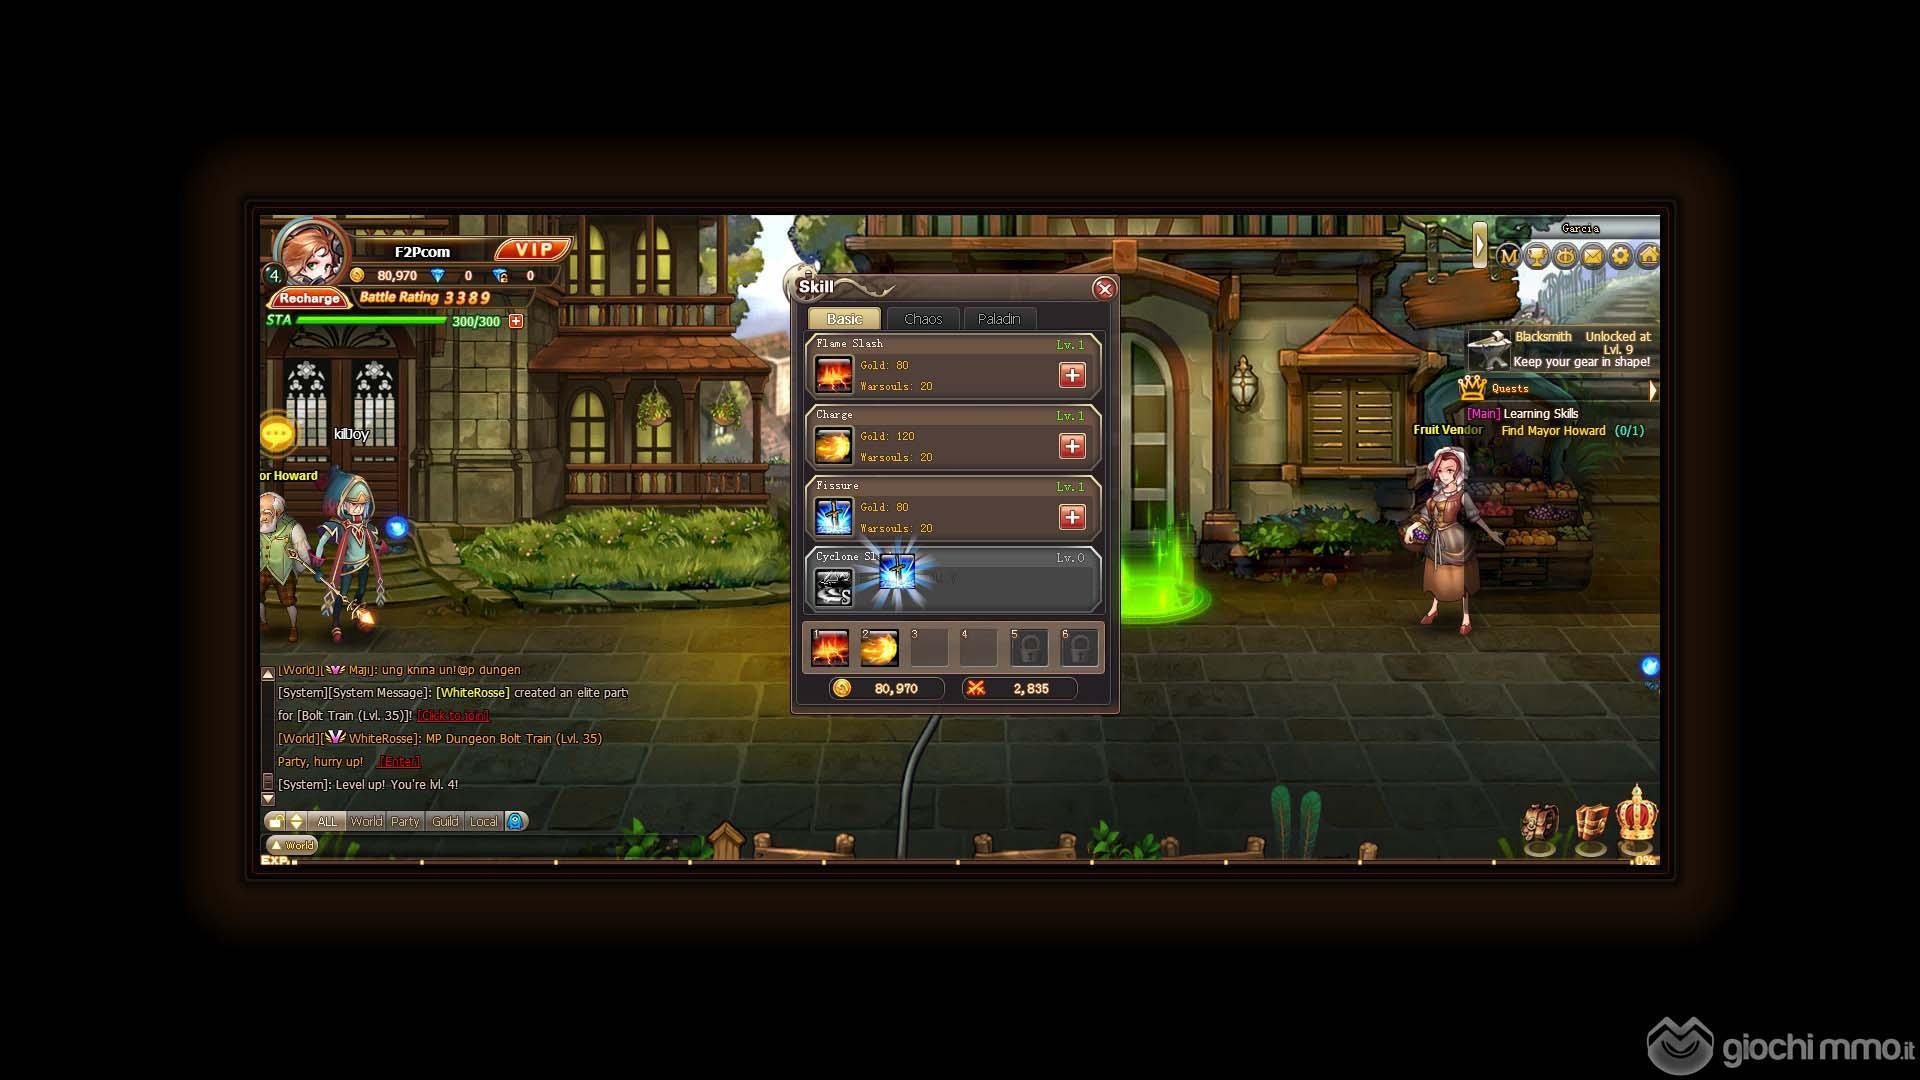 Bleach Online MMORPG